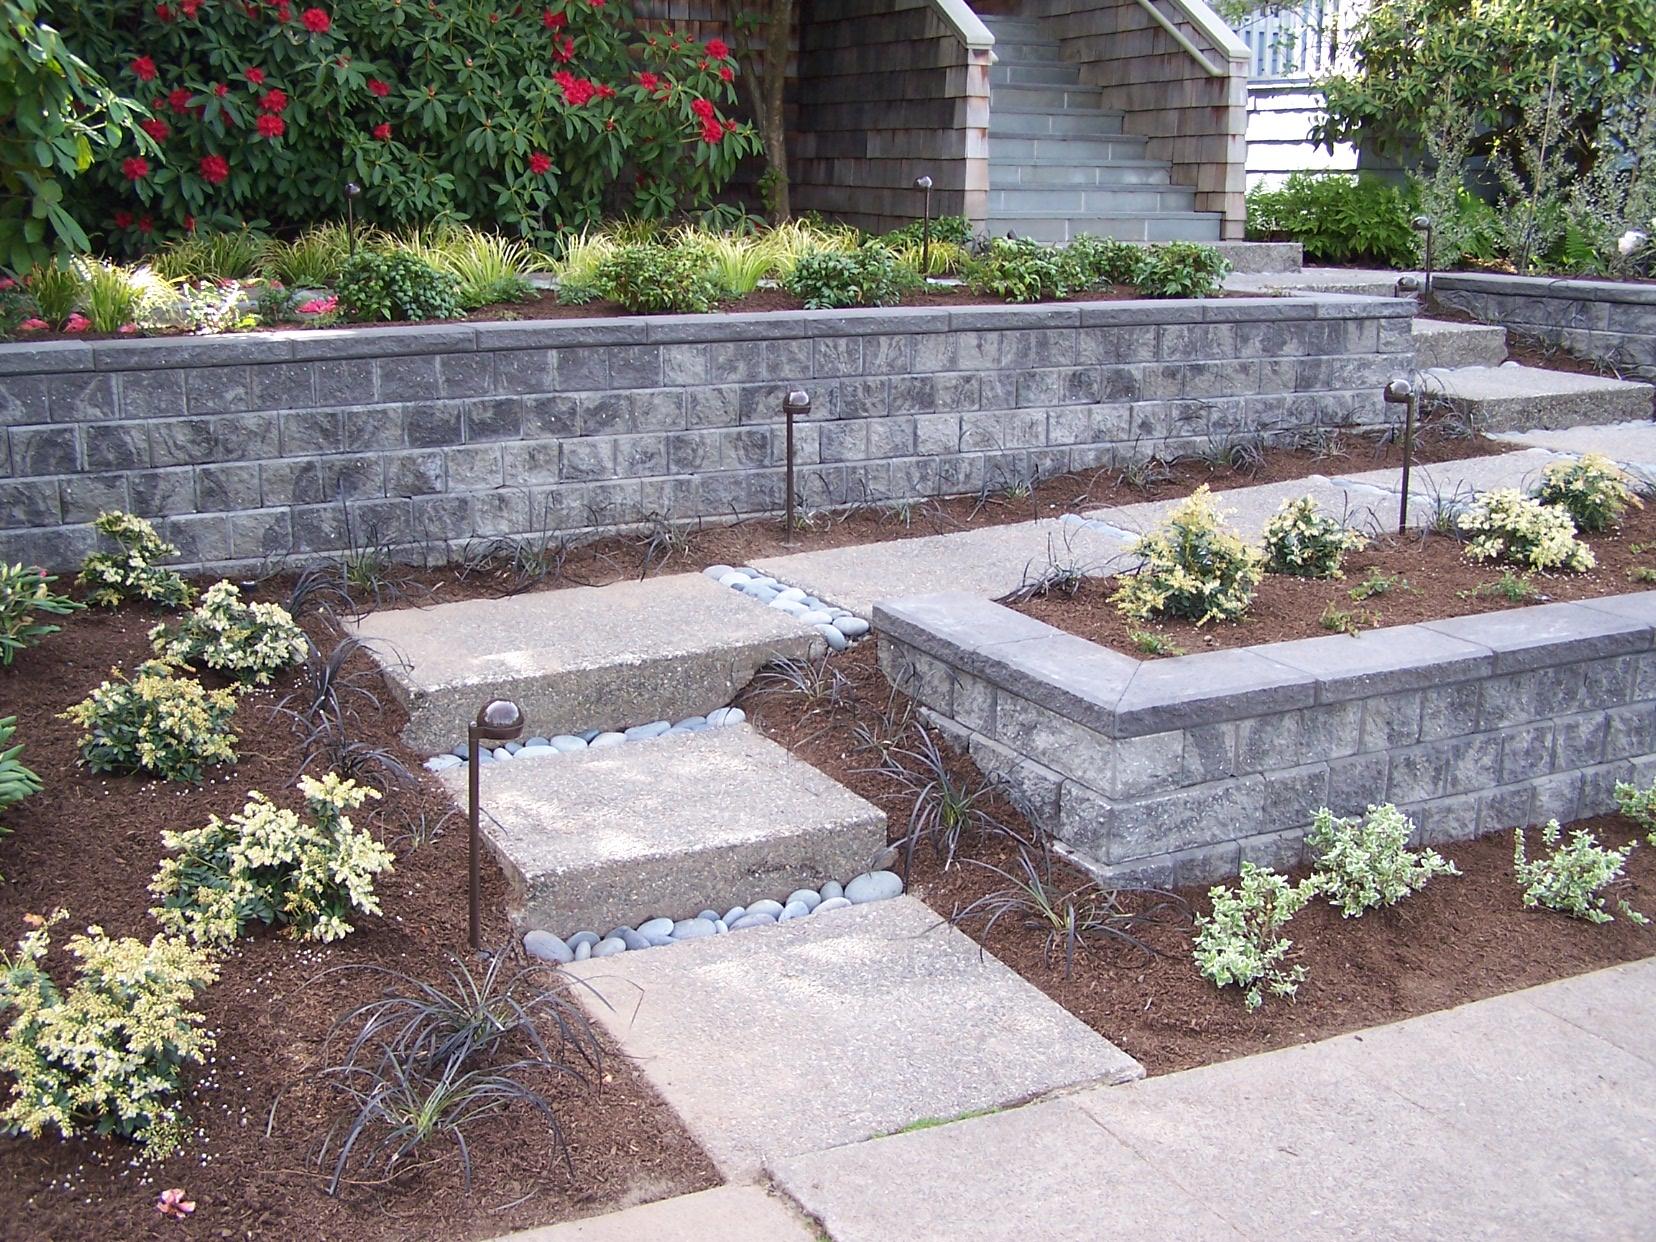 Landscaping Bricks Walmart : Tallar landscaping inc kenmore wa angie s list